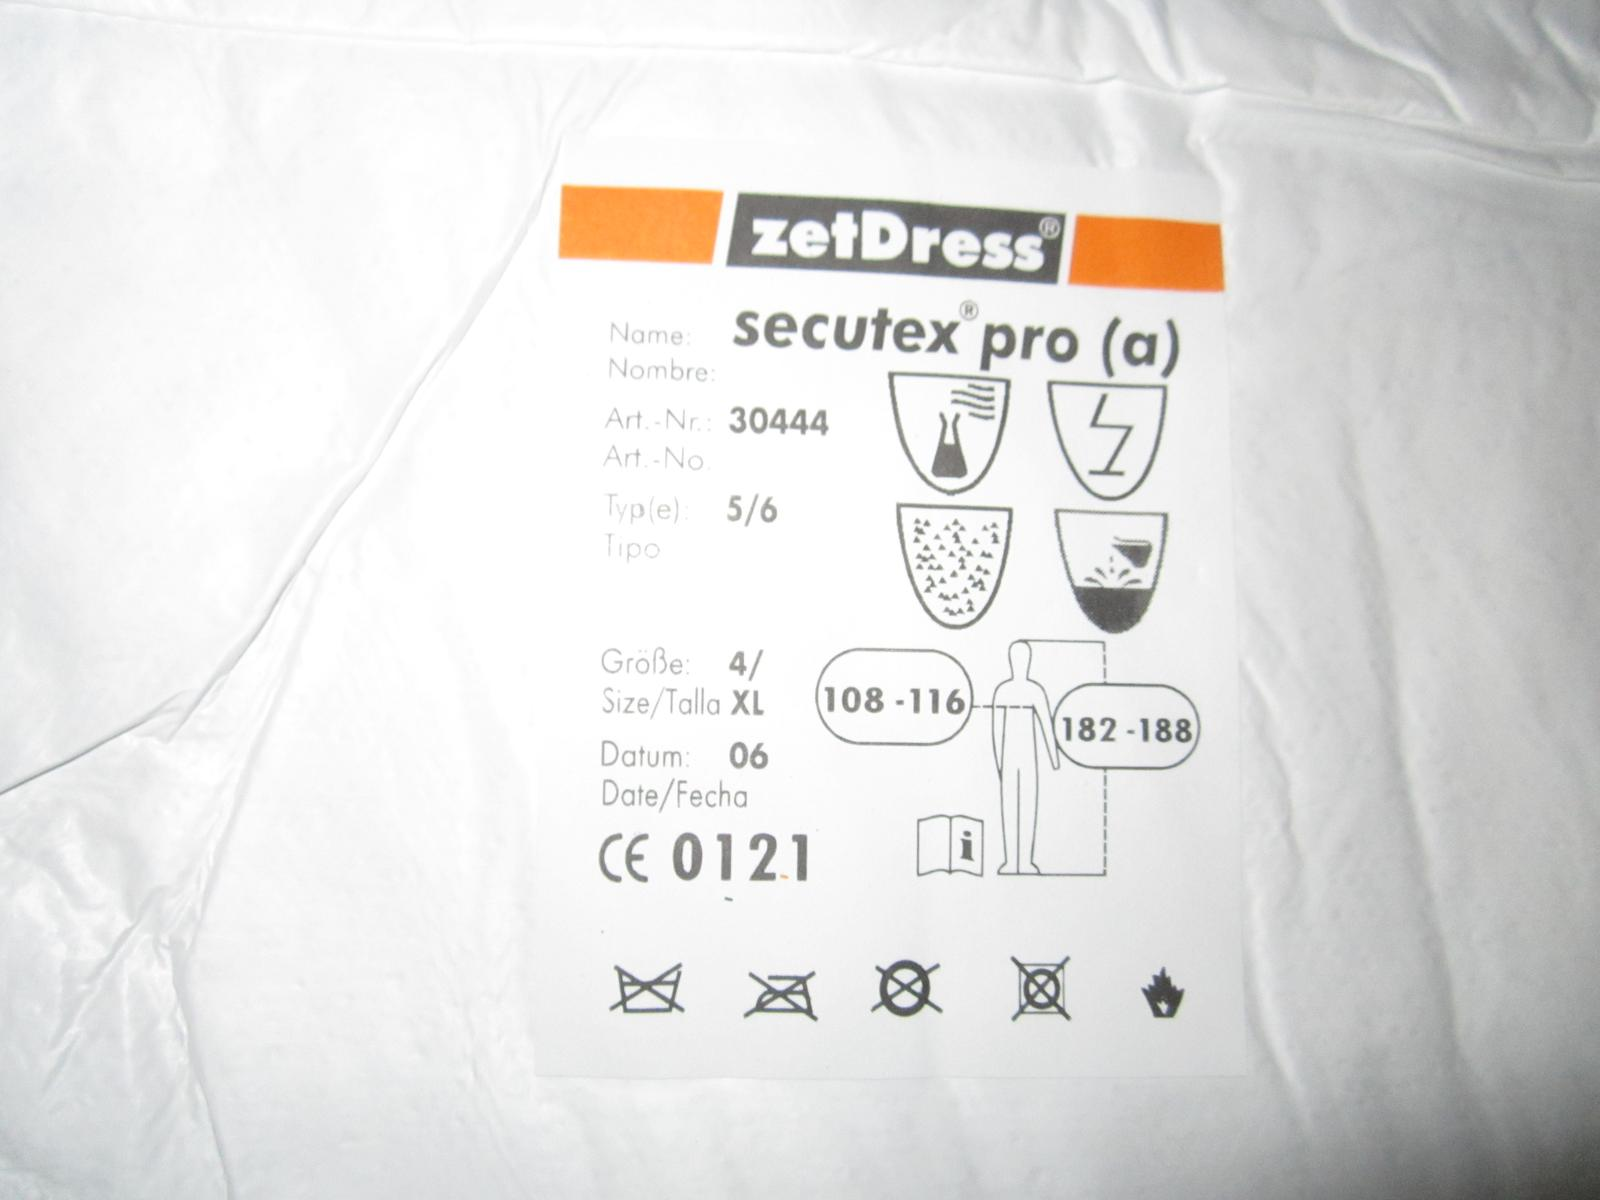 Ochranné oblečenie zetdress-secutex typ 5/6 - Obrázok č. 2